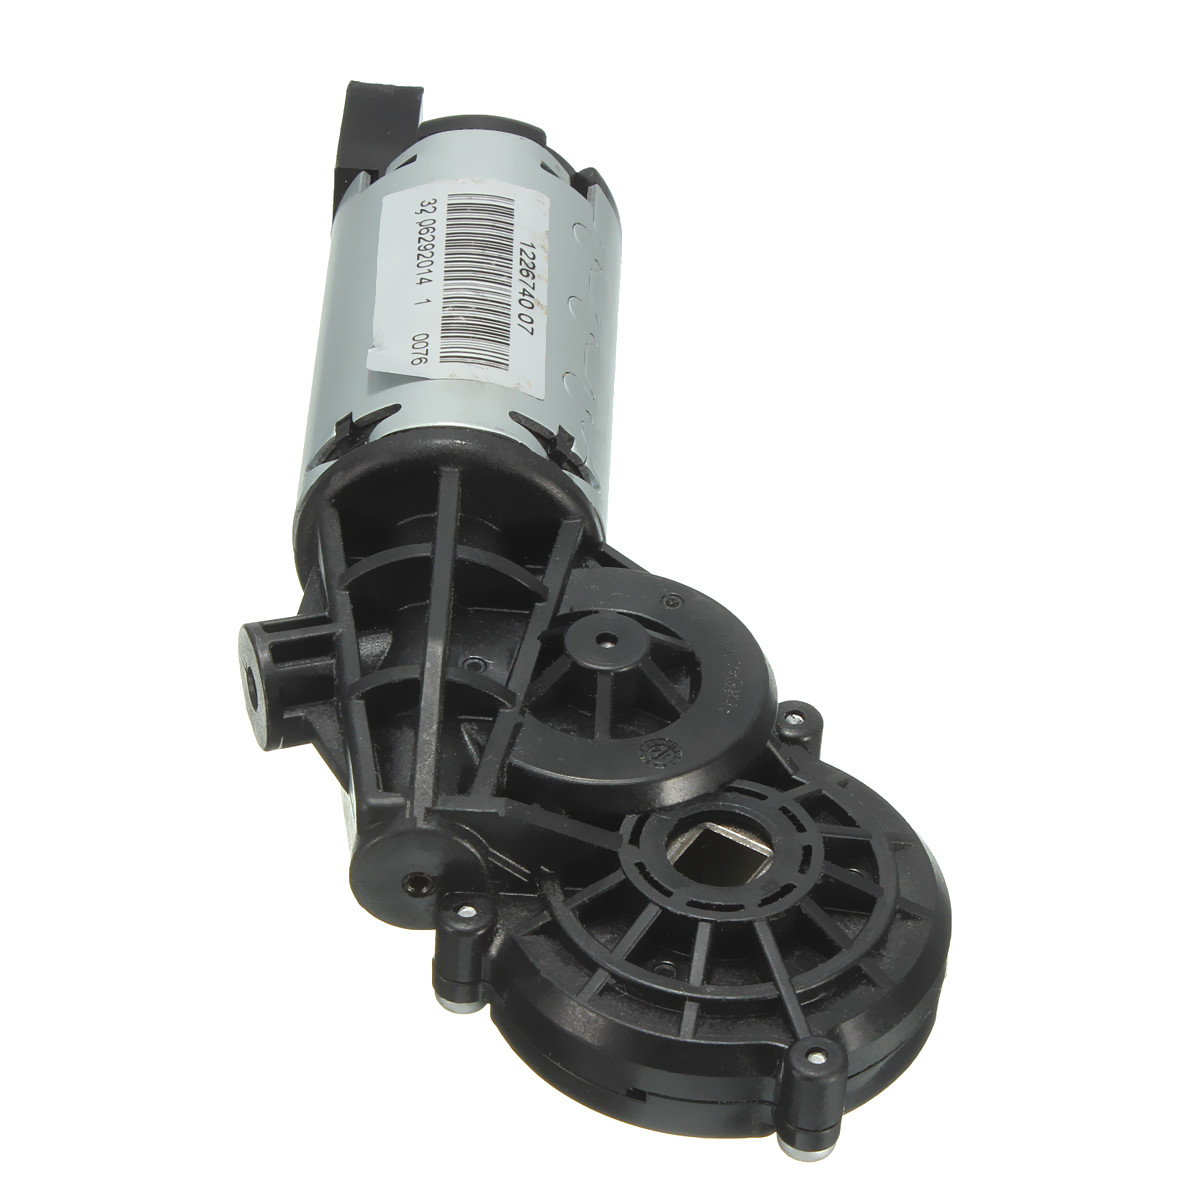 Buy 12v 24v dc worm gear motor high torque magnetic motor for 12v dc gear motor